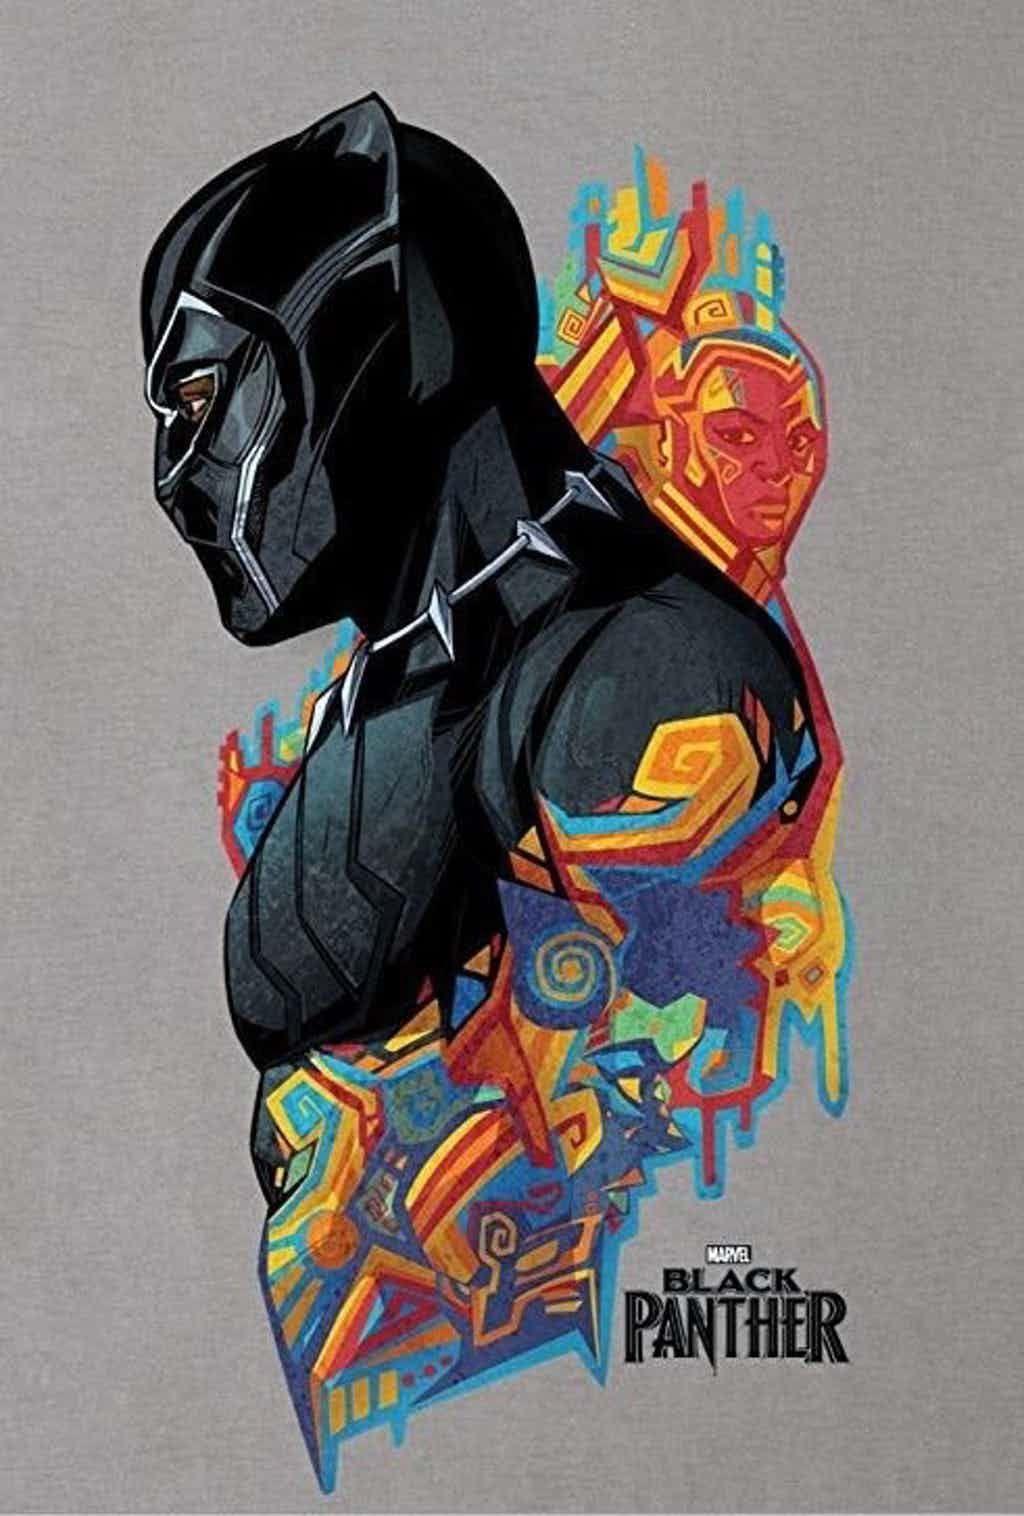 Black Panther Promo Art マーベルのコミックヒーロー映画の最新作